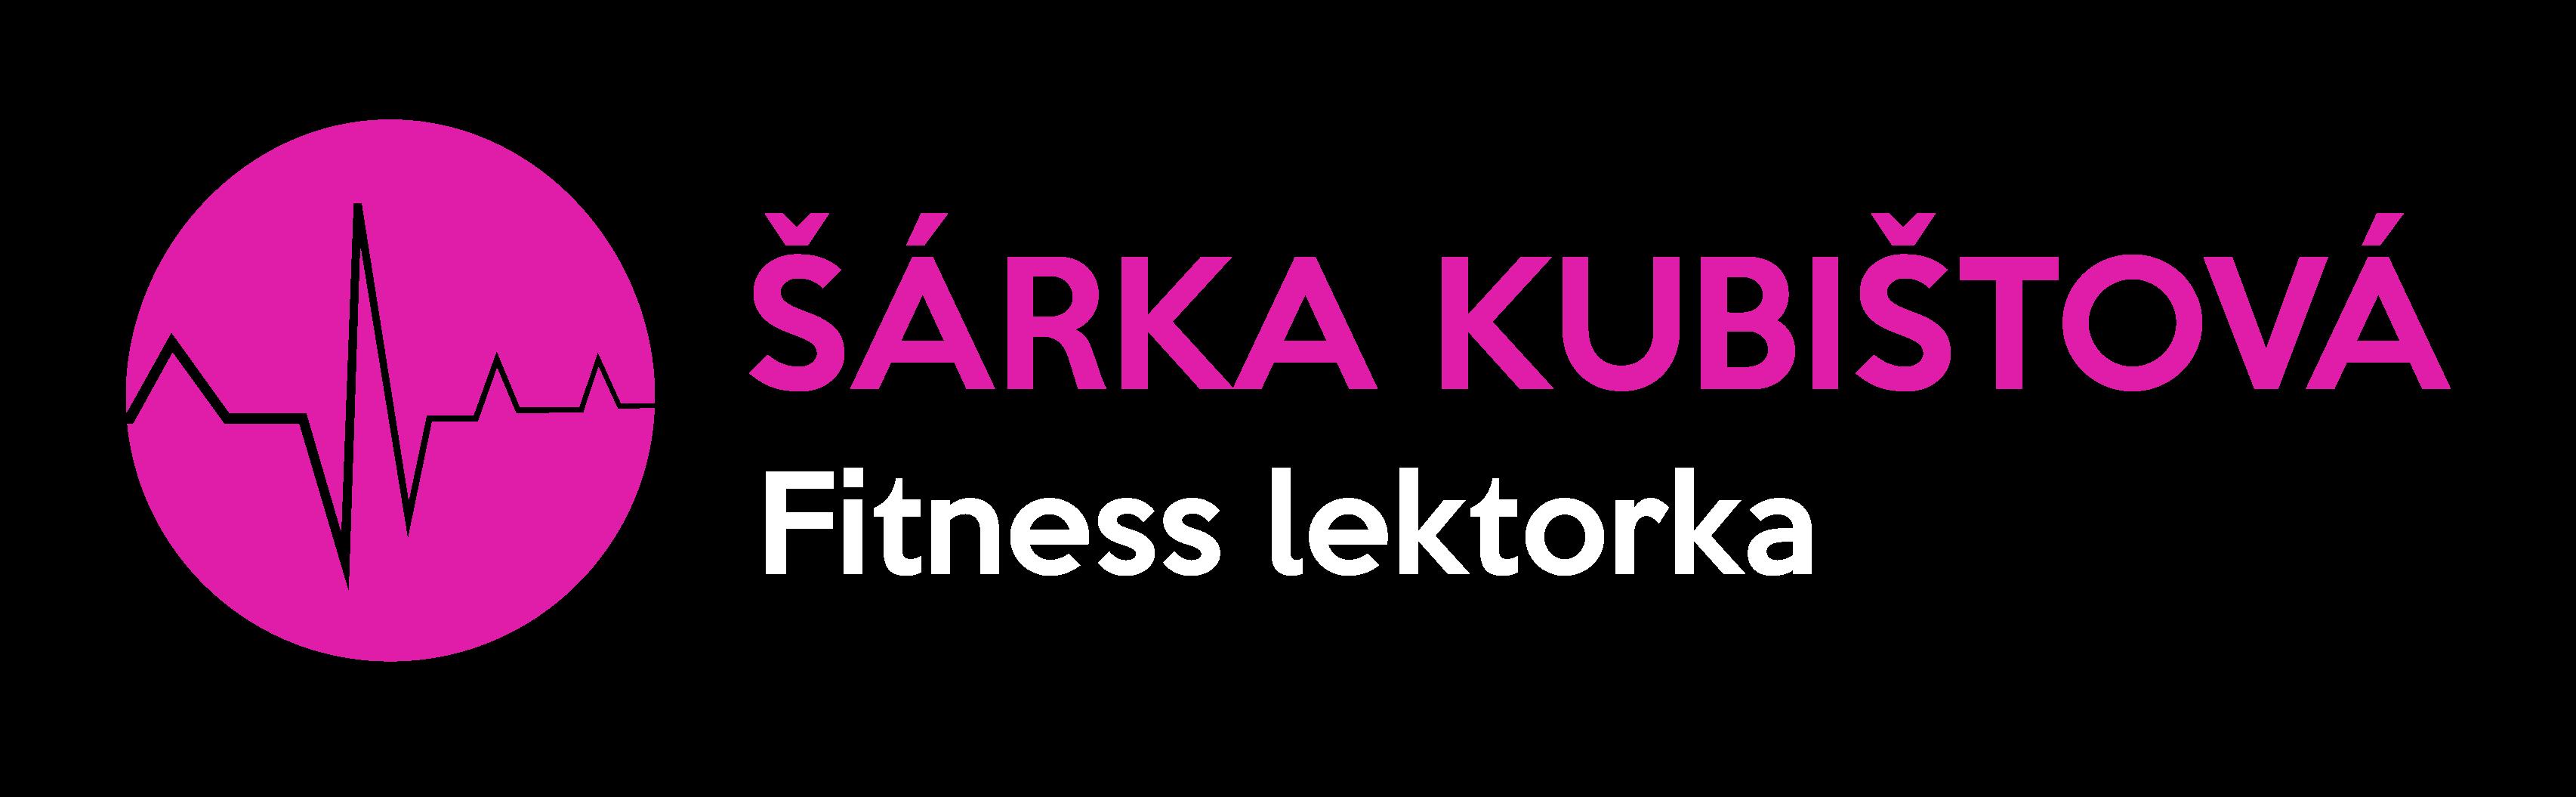 sarka_kubistova